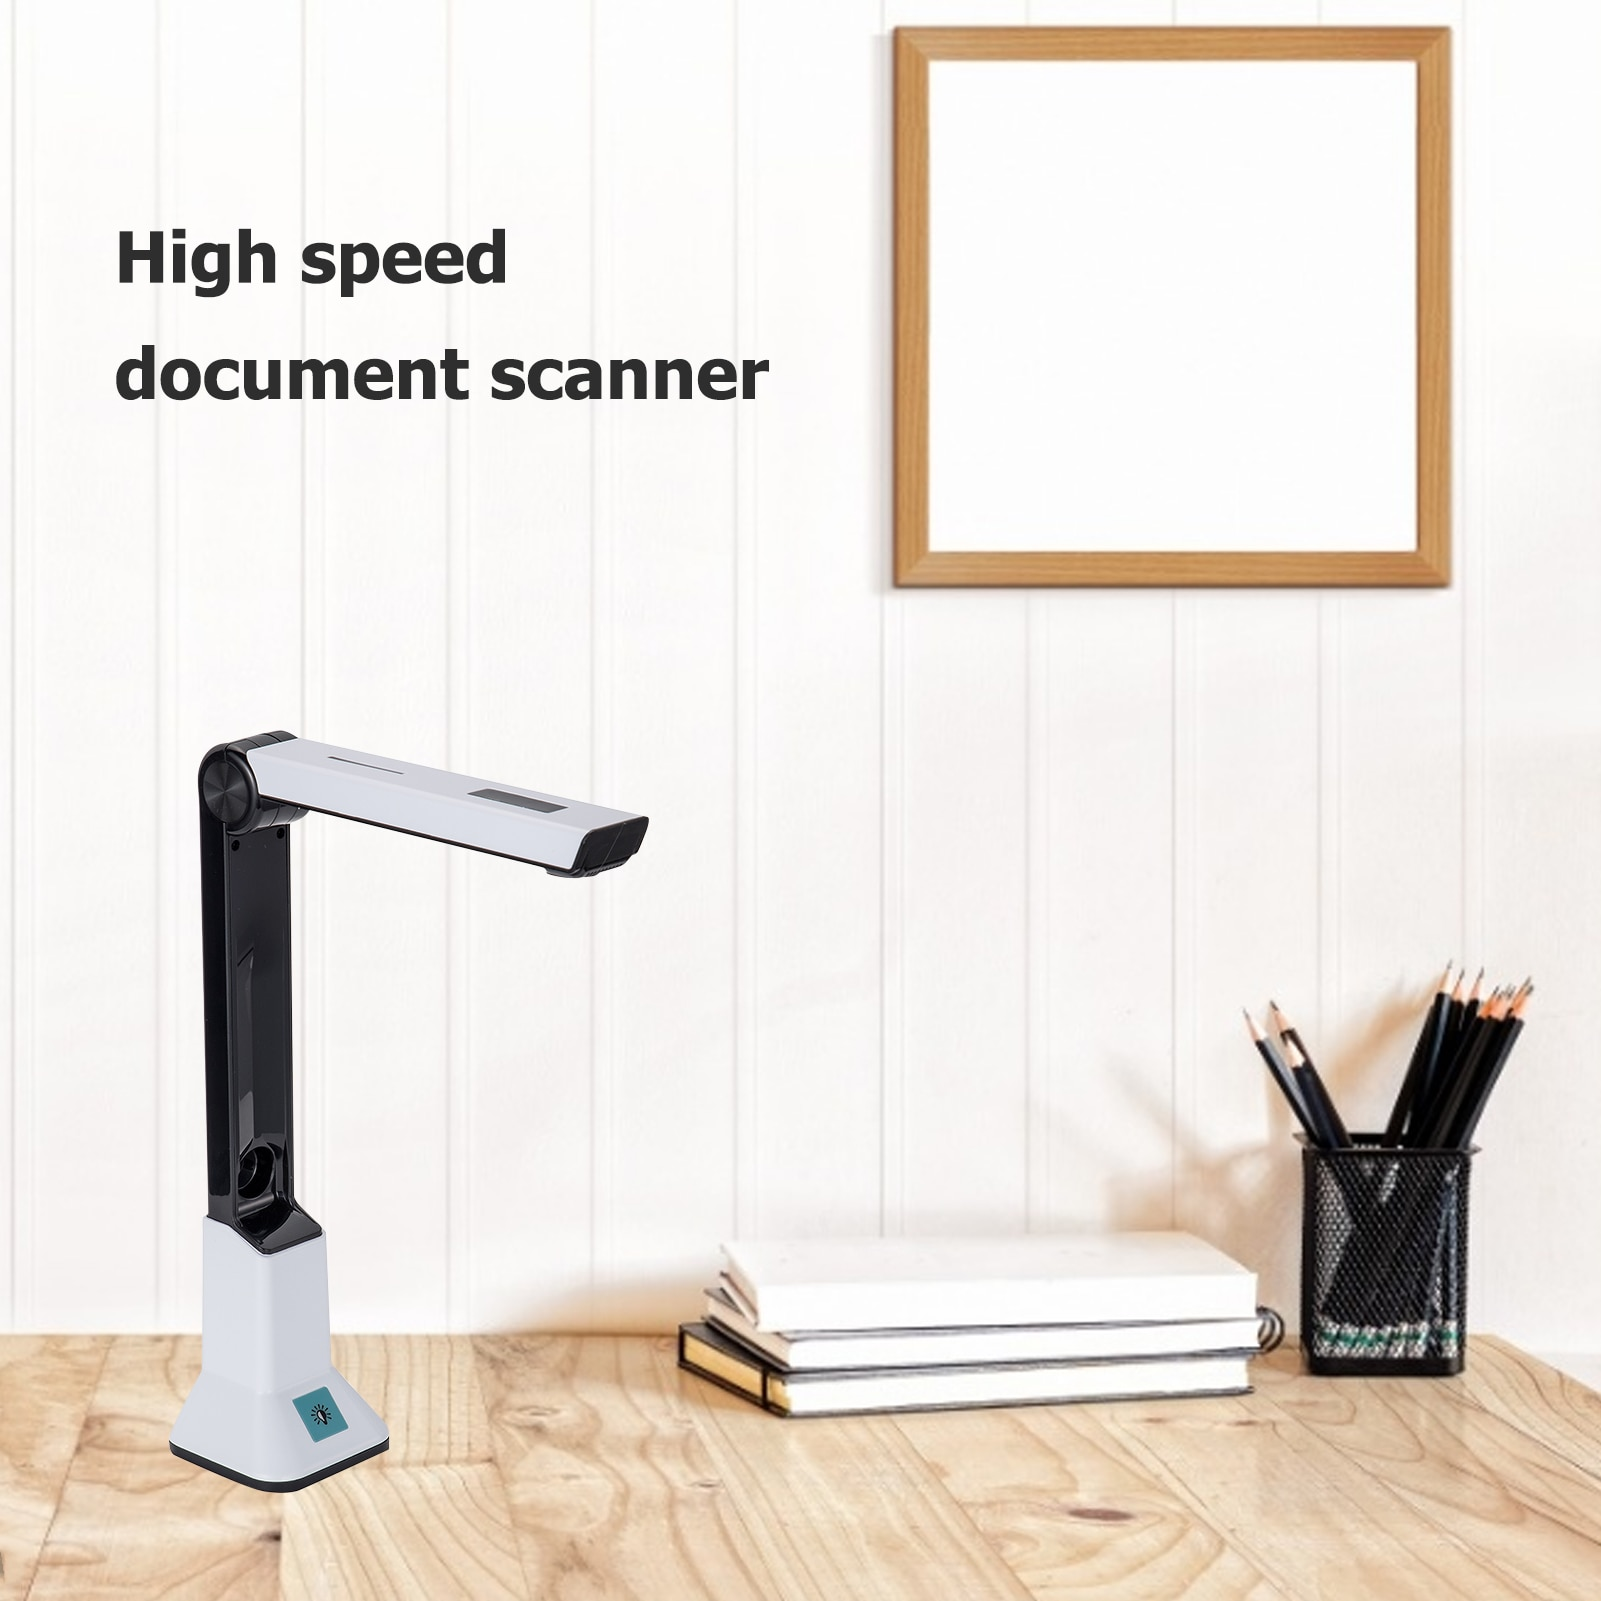 USB 2.0 مريحة 8 مليون بكسل A4 تنسيق عالية الوضوح وثيقة عالية السرعة الماسح الضوئي كاميرا للمستندات قوس